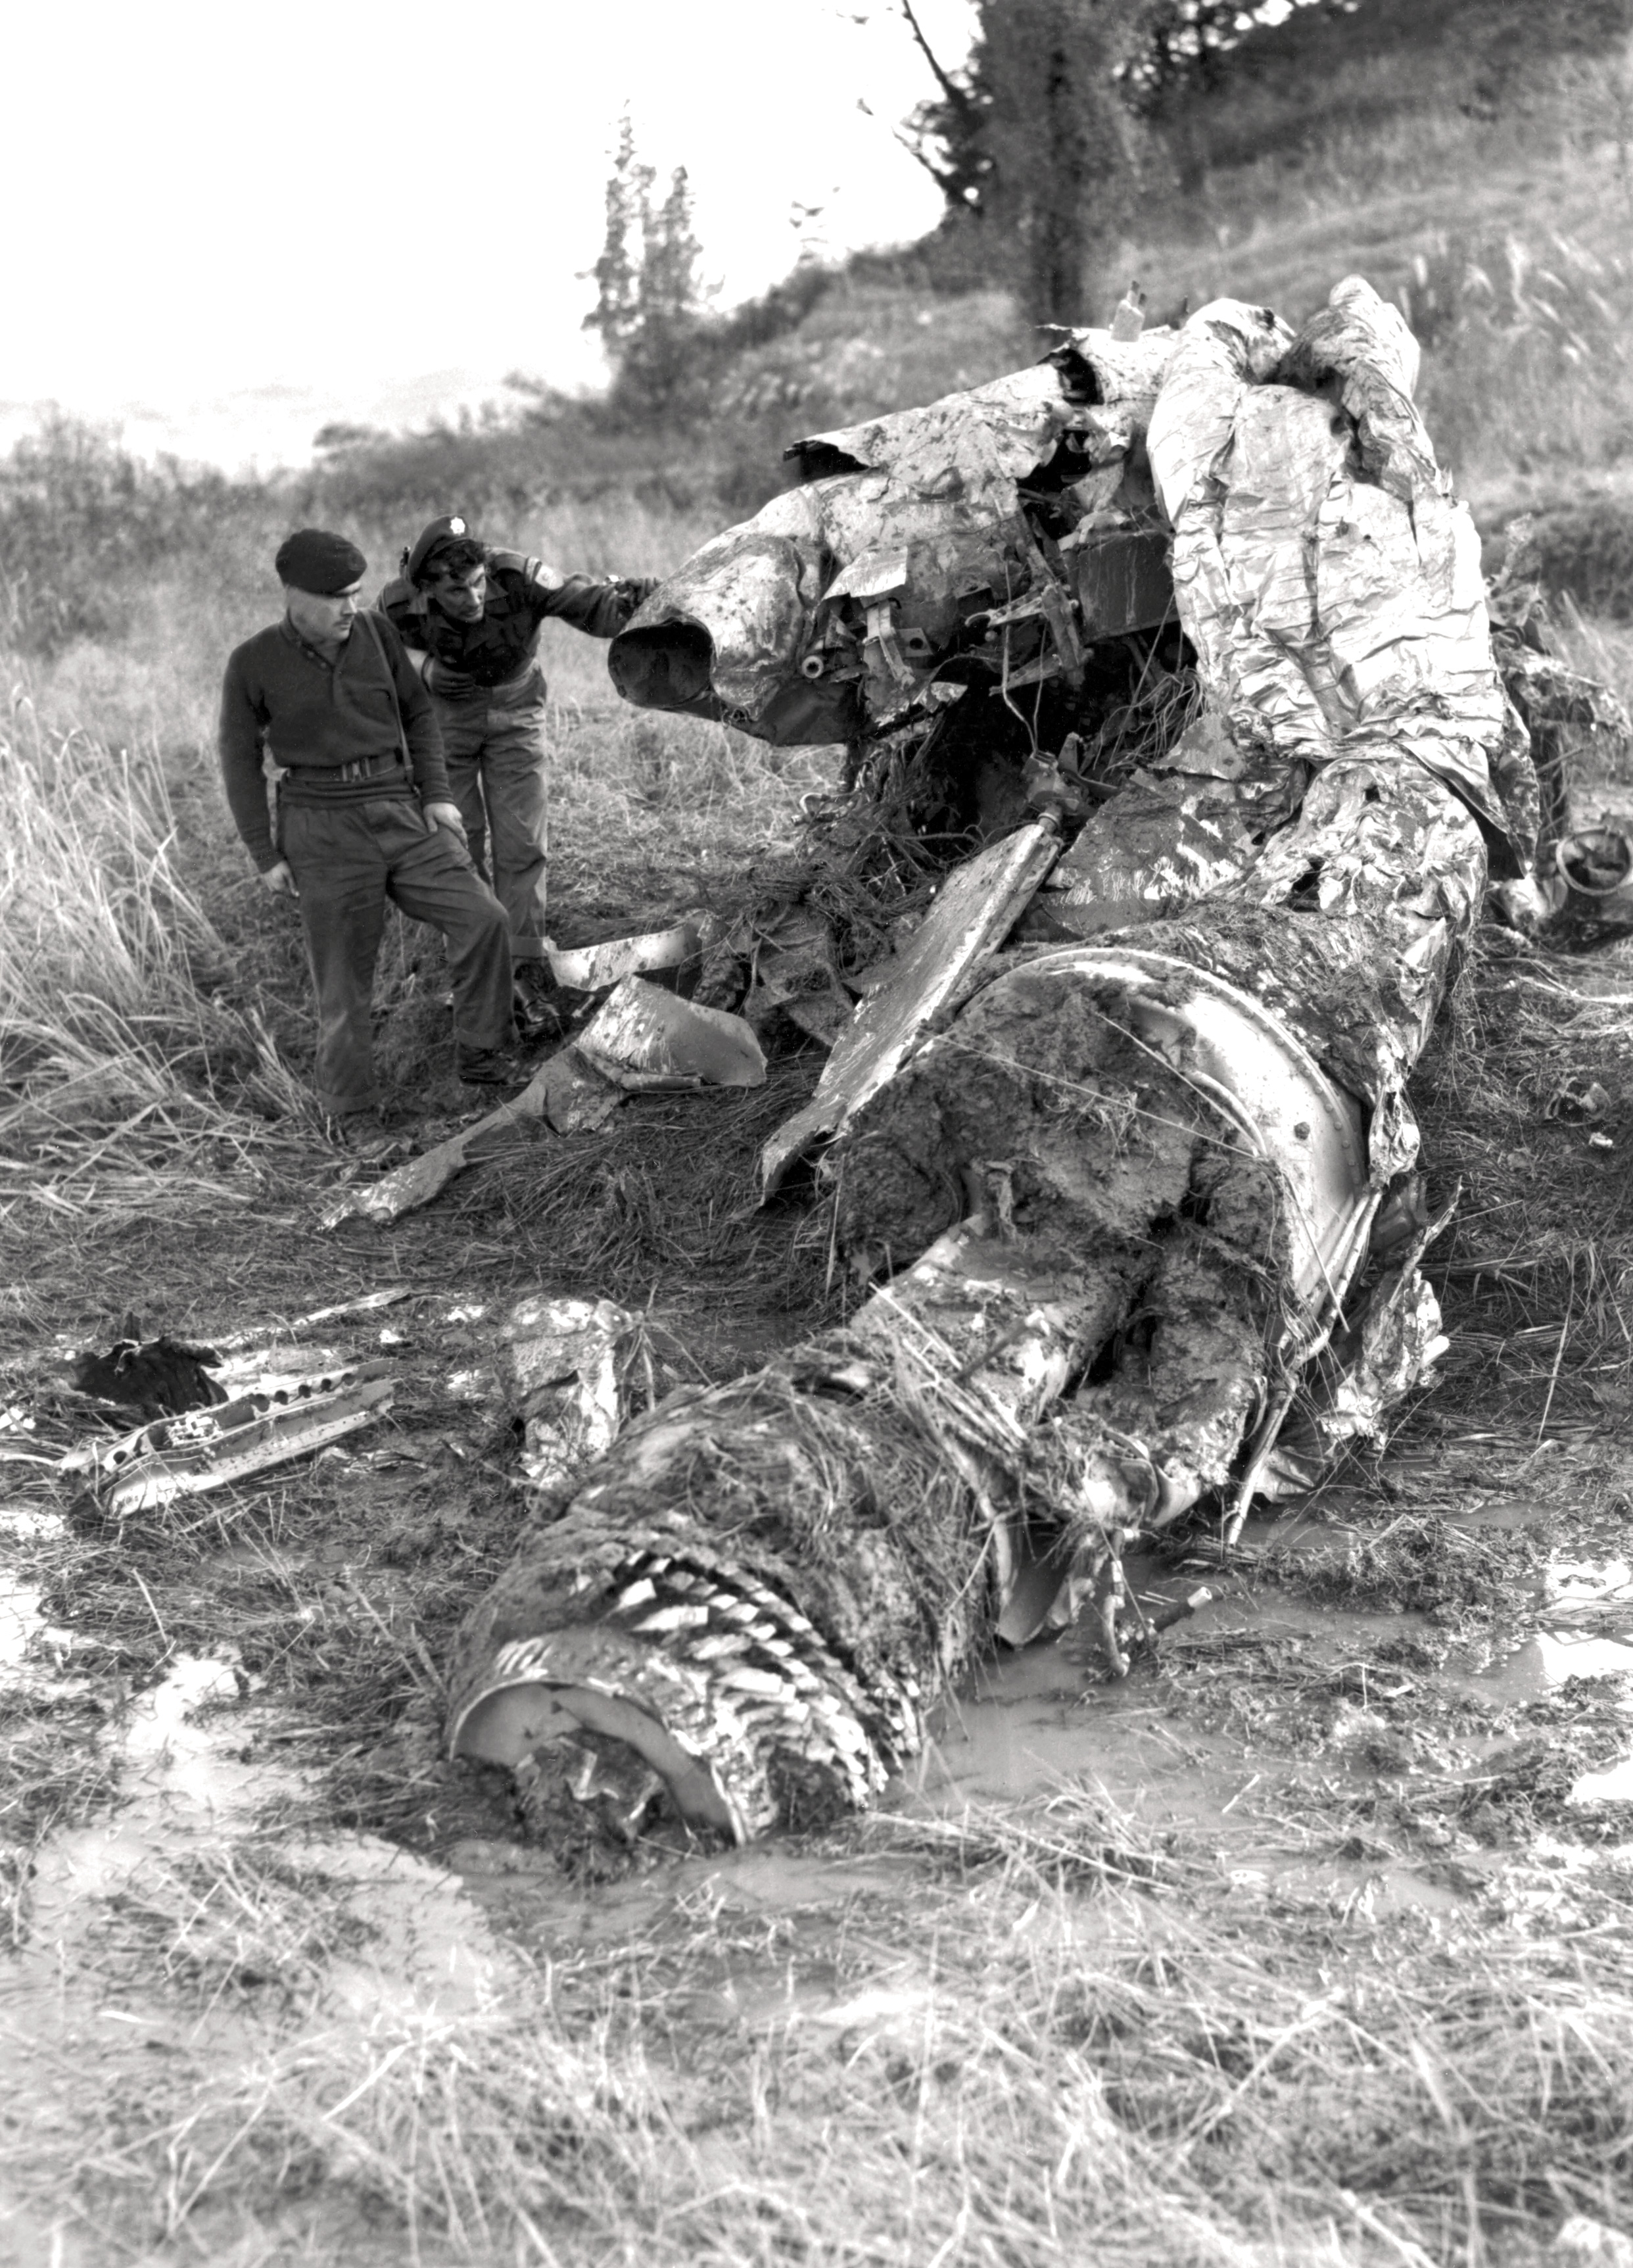 Historic Korean War Photo – Examining The Wreckage